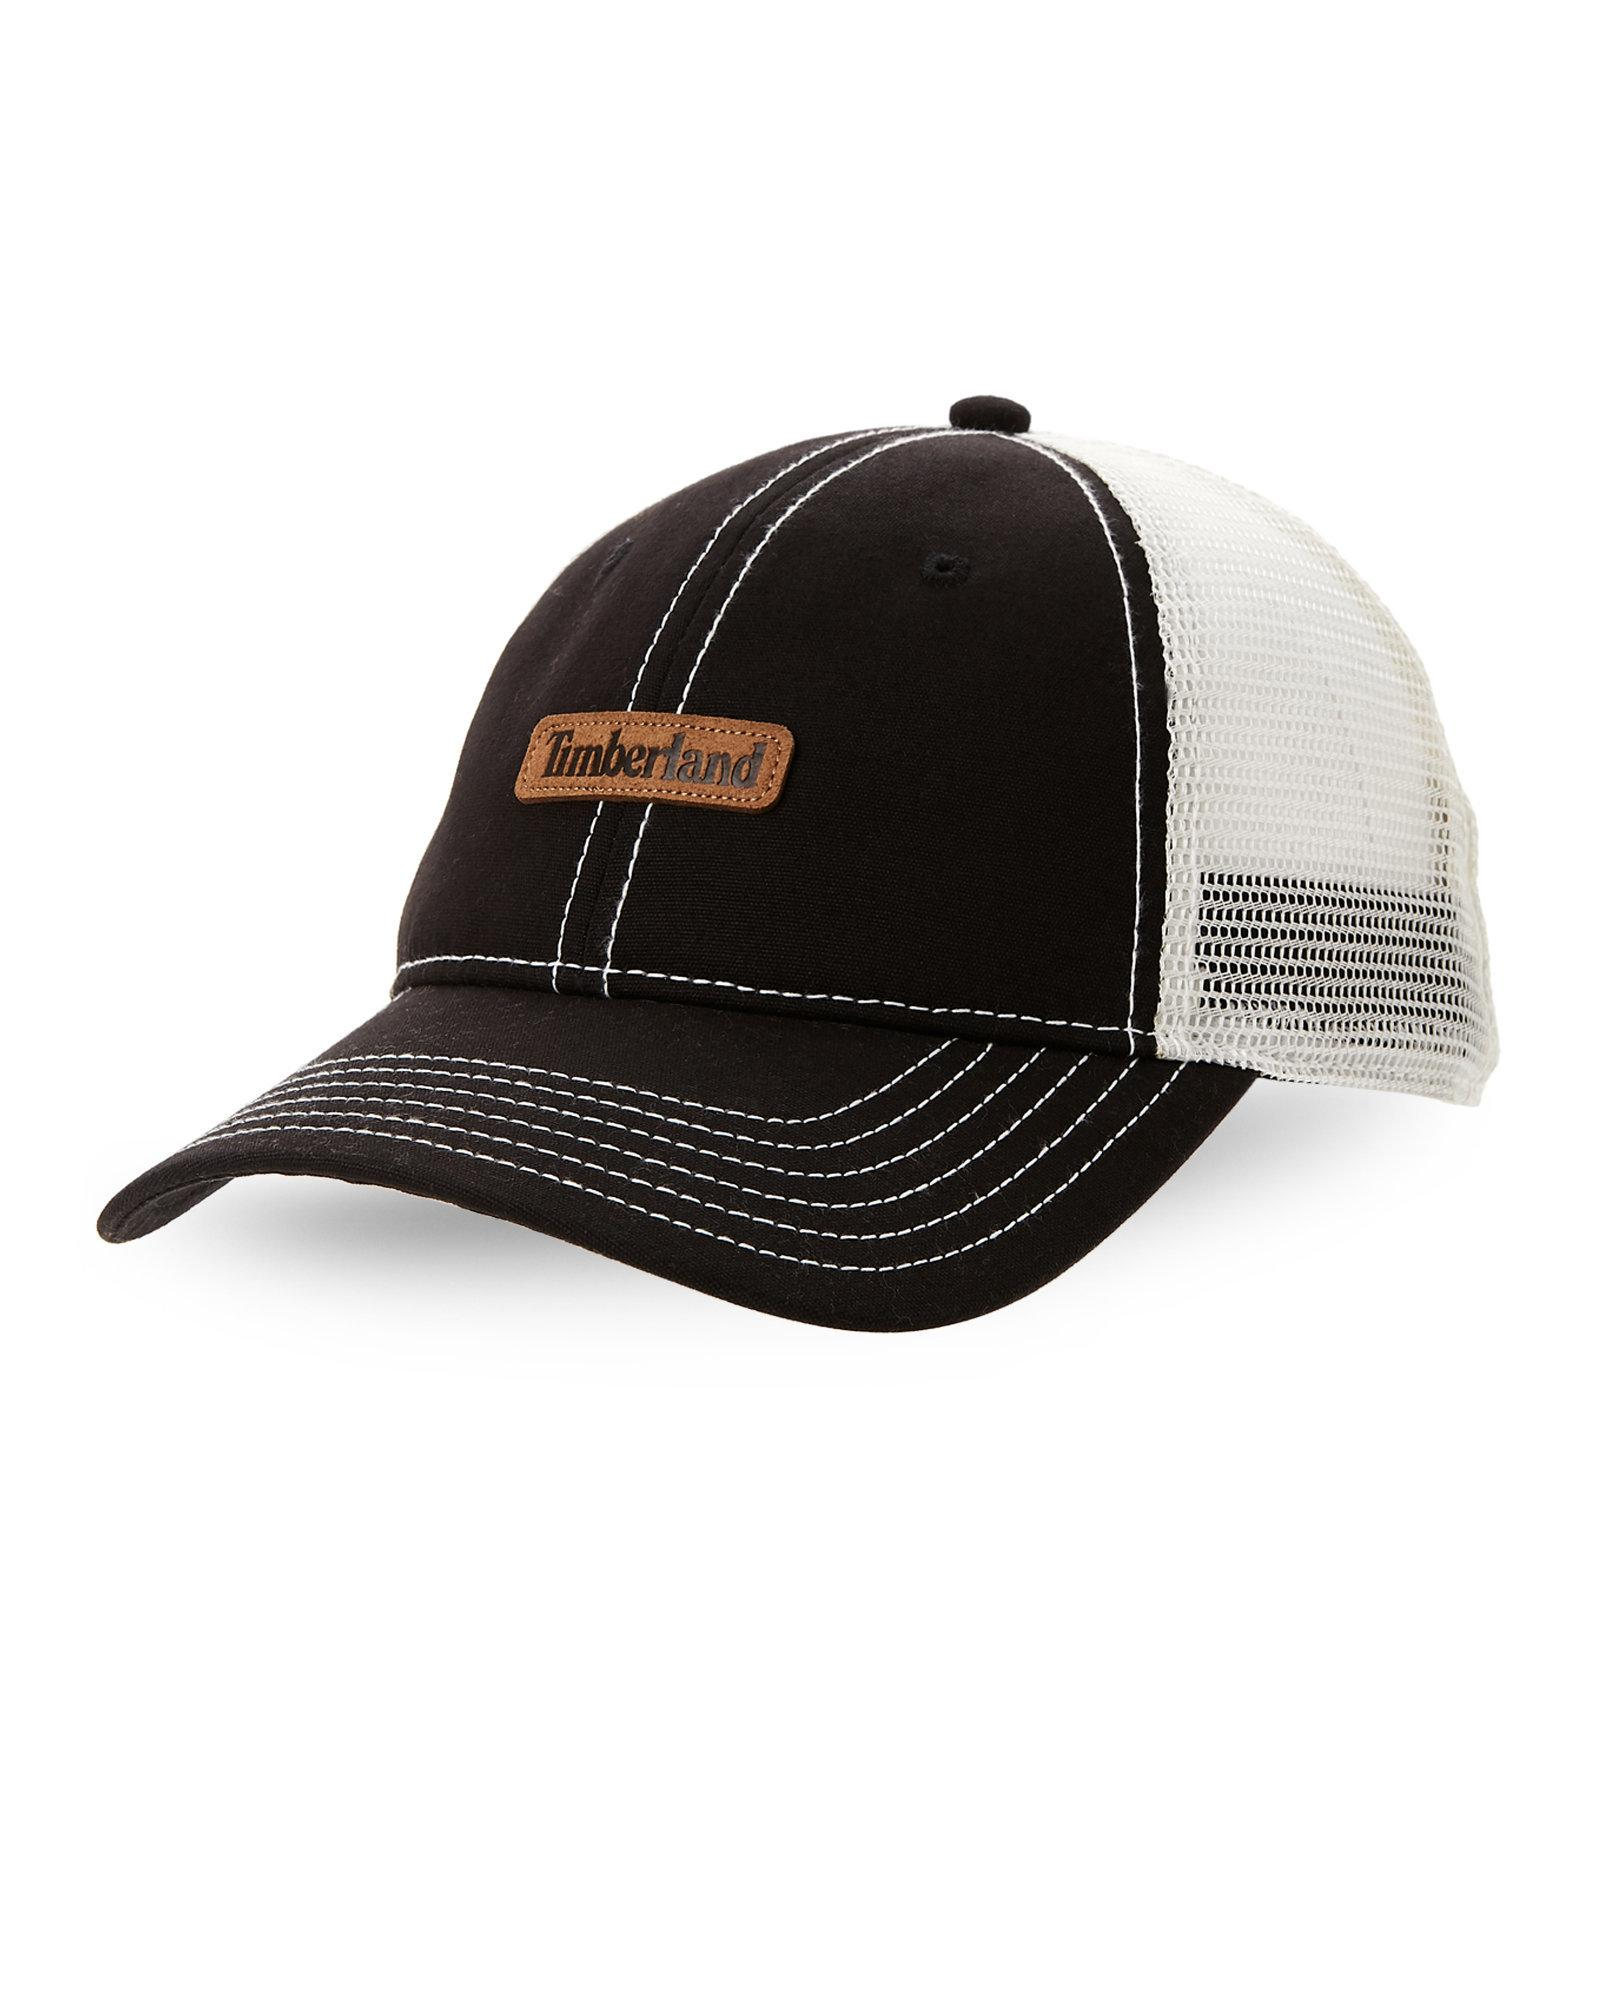 796e7ba0 Timberland Trucker Hat in Black for Men - Lyst